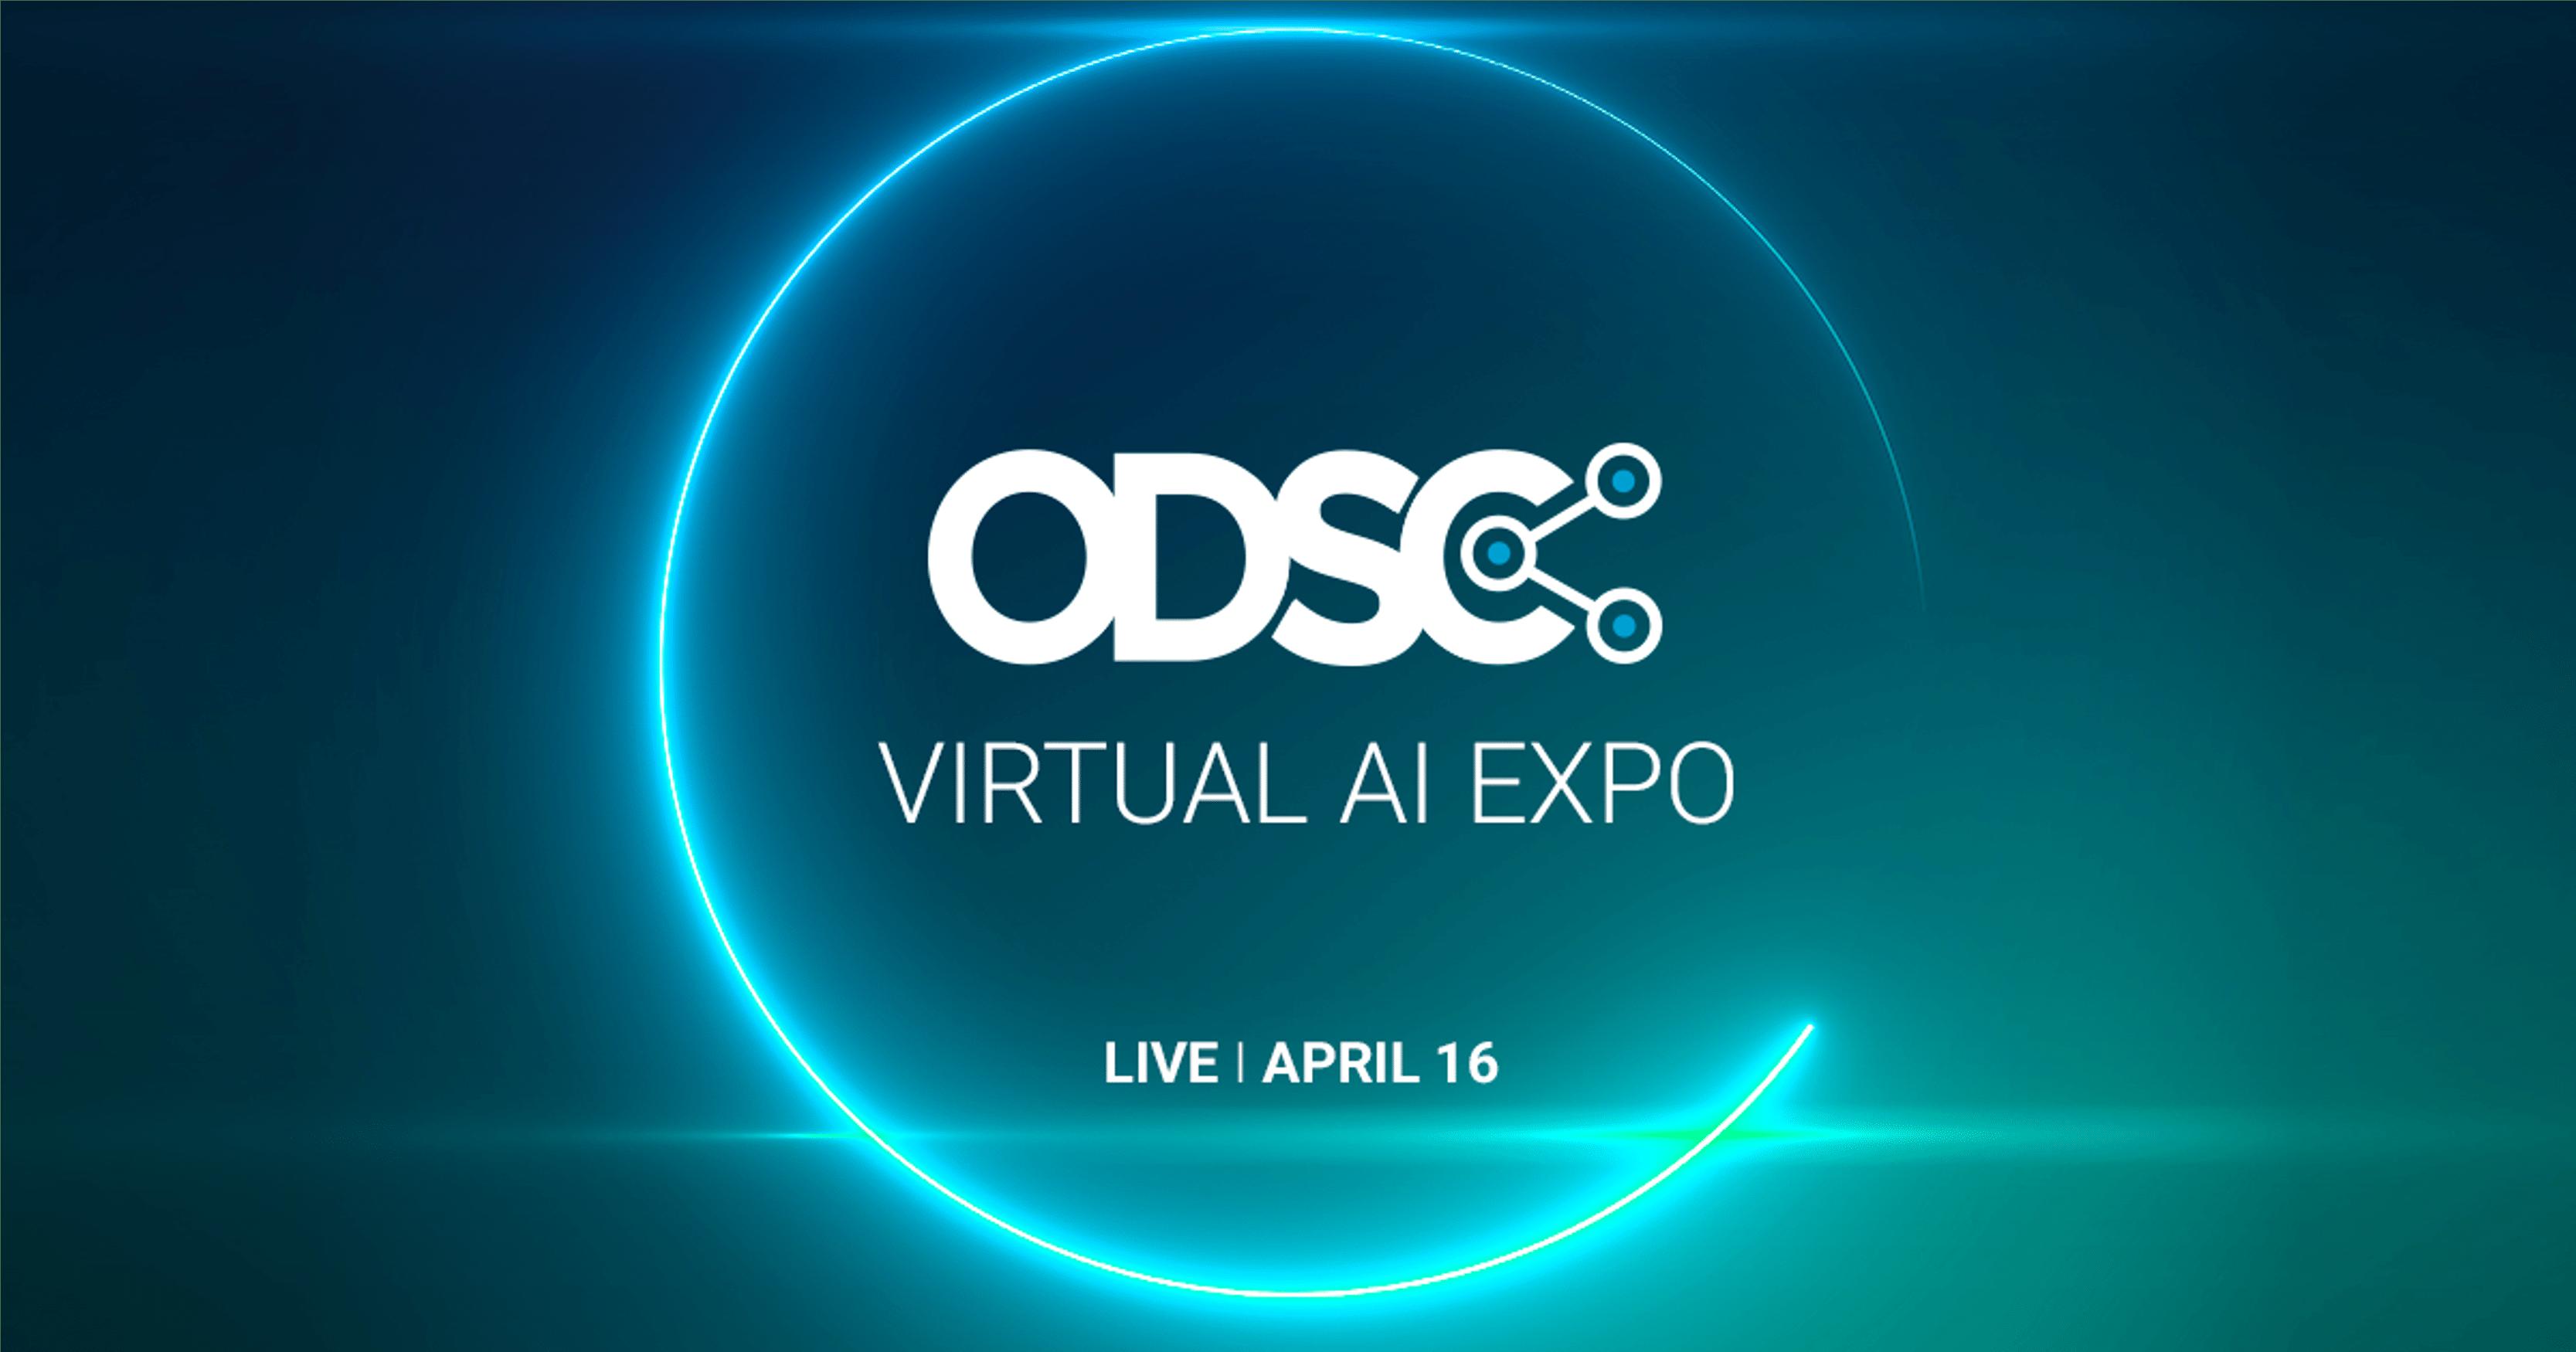 odsc virtual event